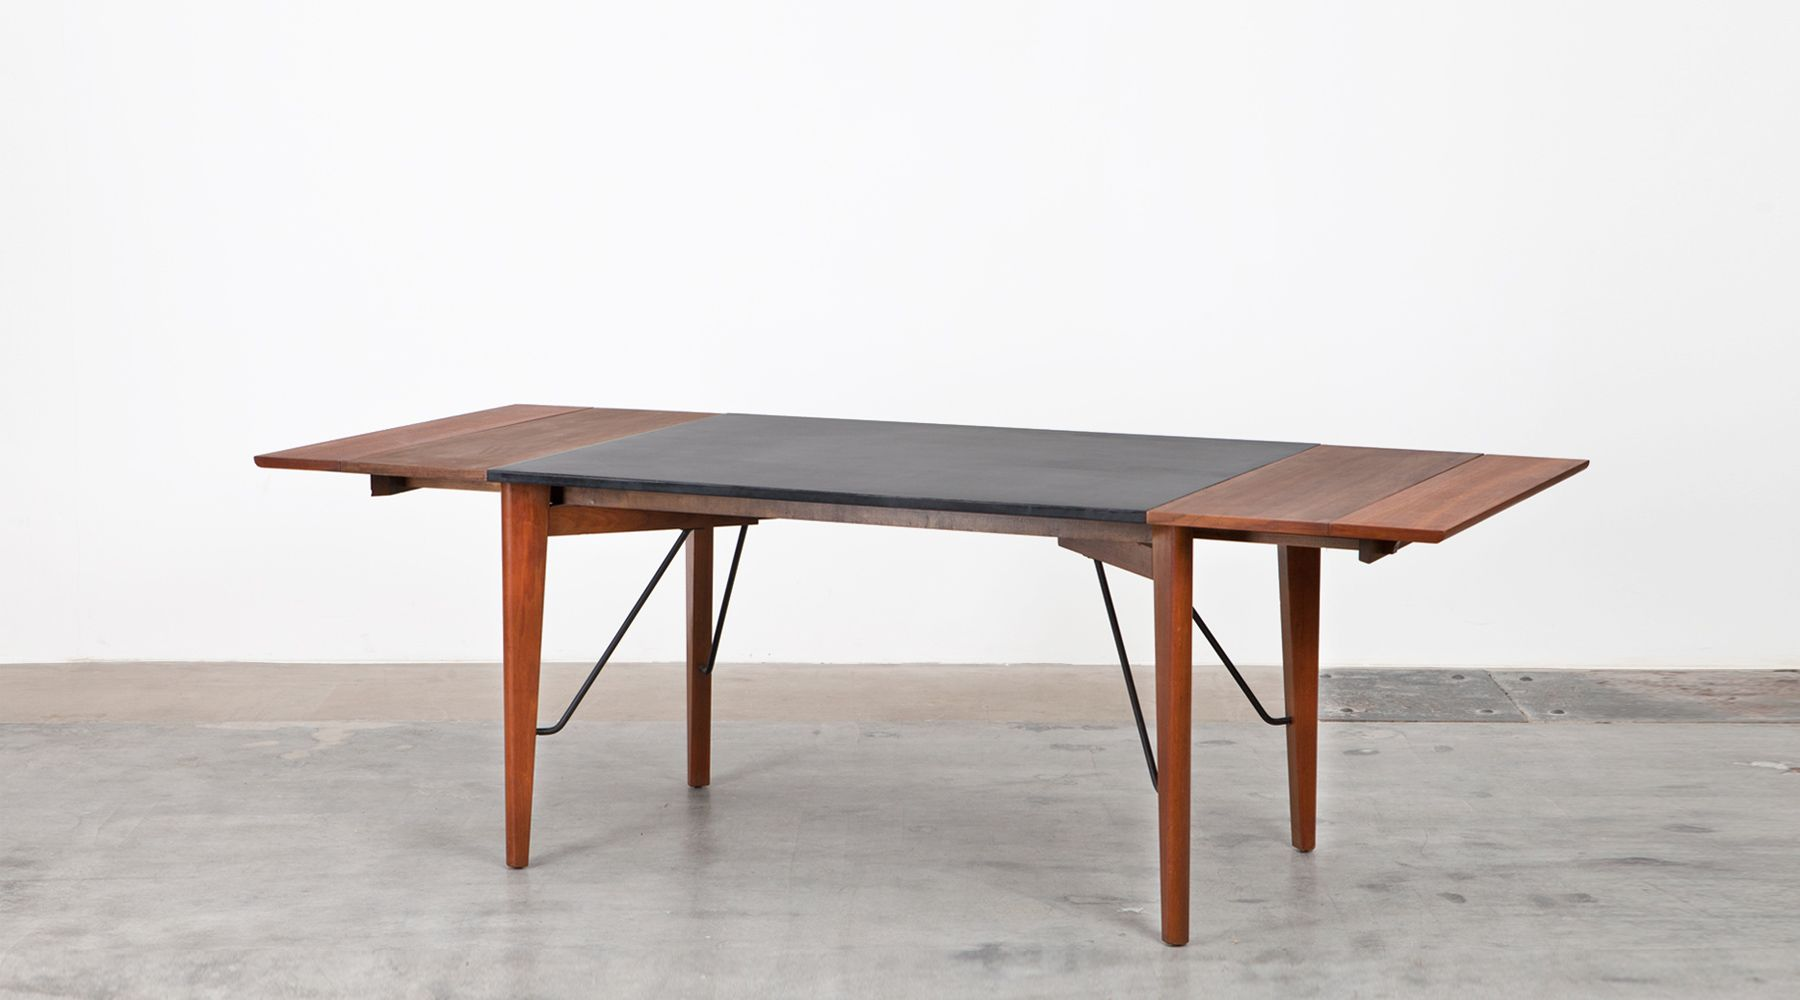 Greta magnusson grossman table design fundament pinterest greta magnusson grossman table geotapseo Gallery